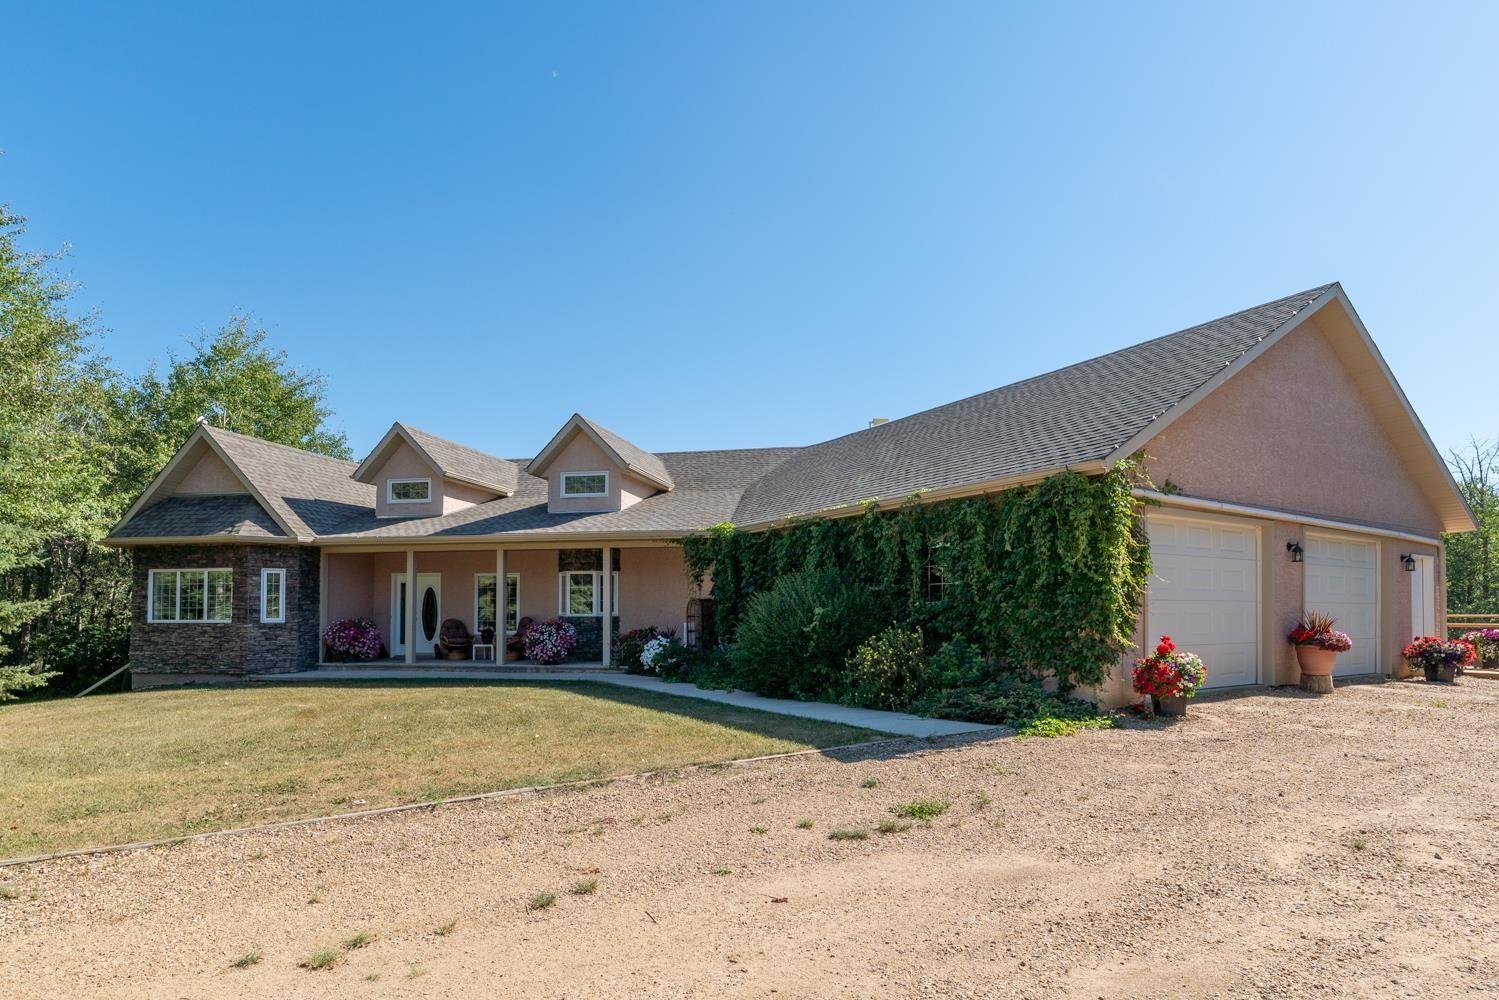 Main Photo: 67 50121 RR 204: Rural Beaver County House for sale : MLS®# E4258930